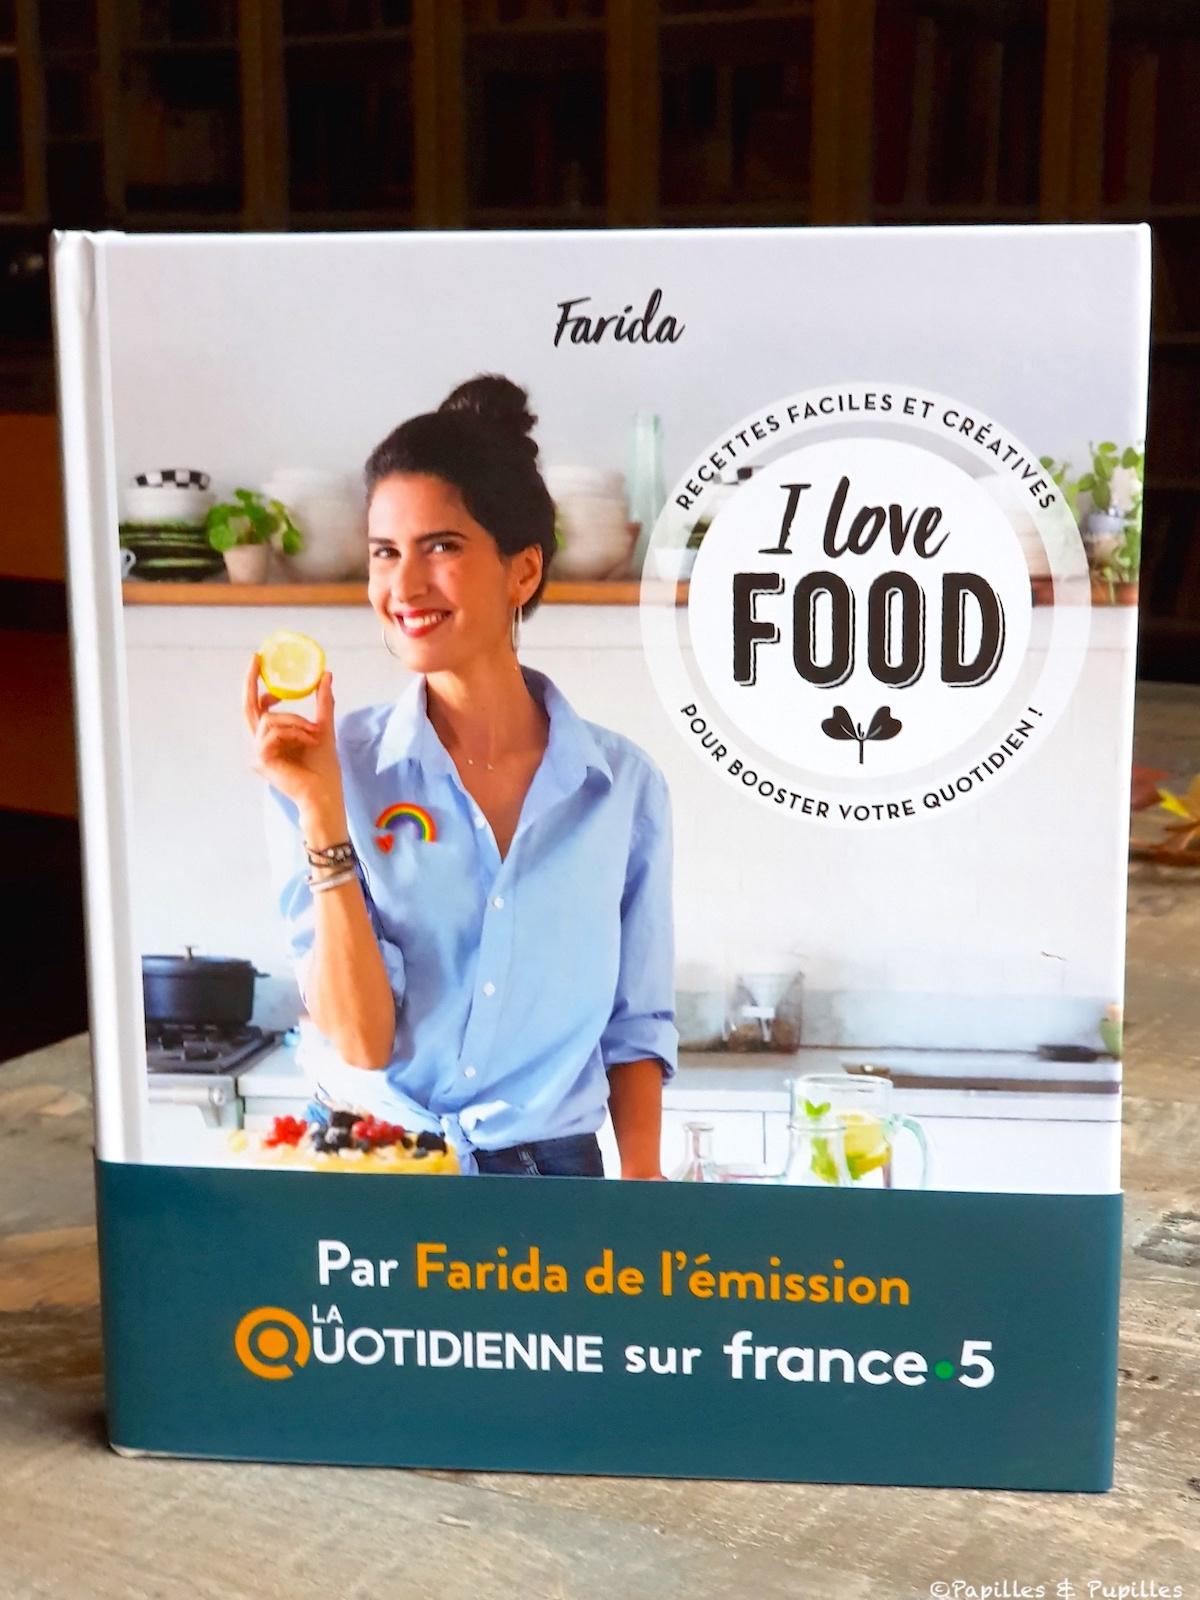 Farida - I love food